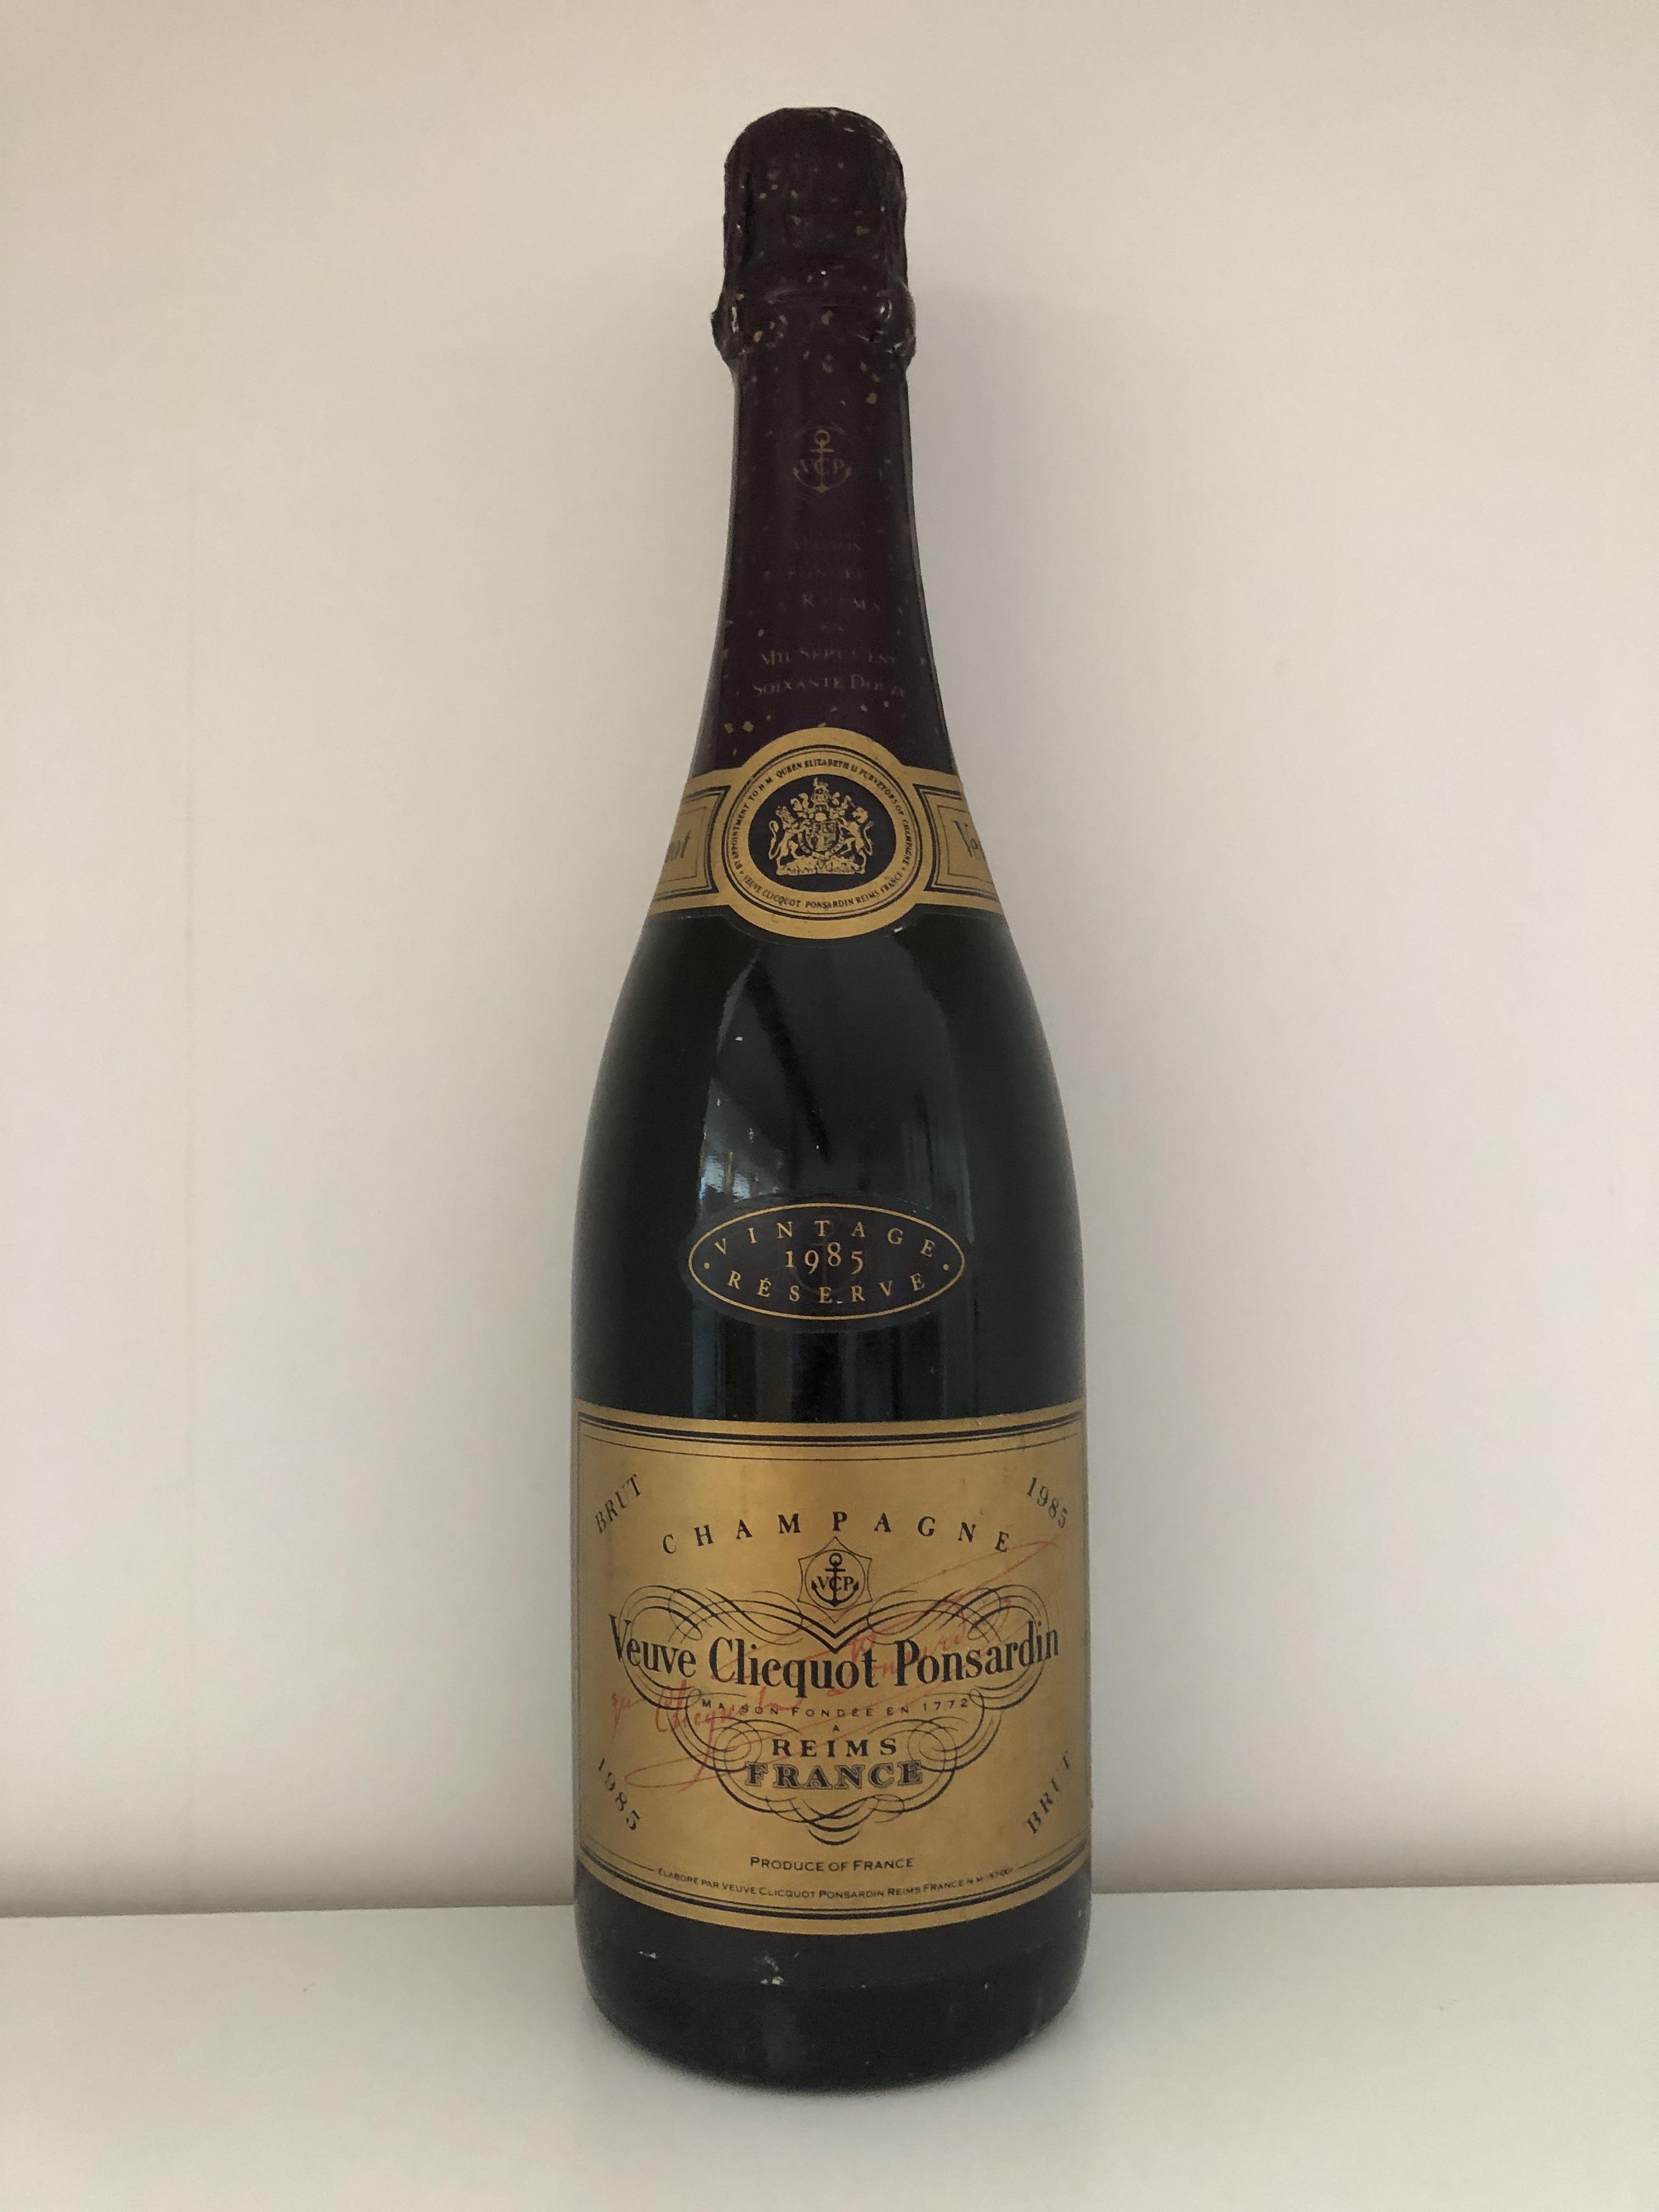 Lot 35 - 1985 Veuve Clicquot Vintage Reserve, Champagne, France, 1 bottle